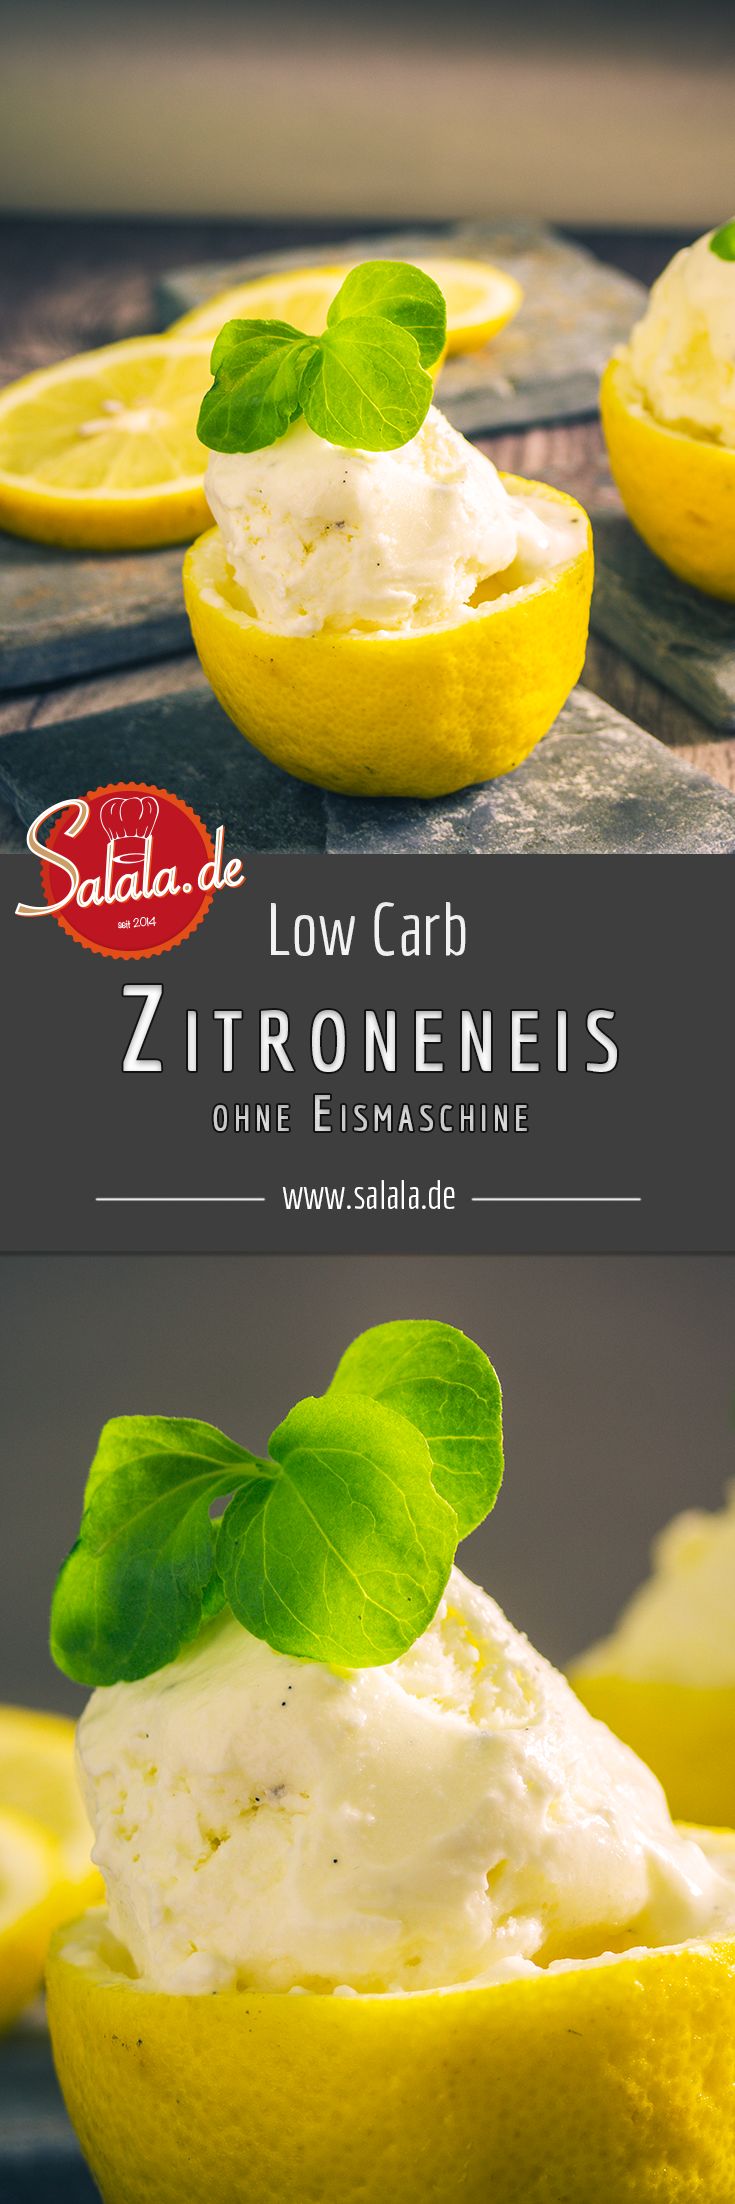 Zitroneneis Low Carb glutenfrei - ohne Eismaschine | salala.de – Low Carb leicht gemacht